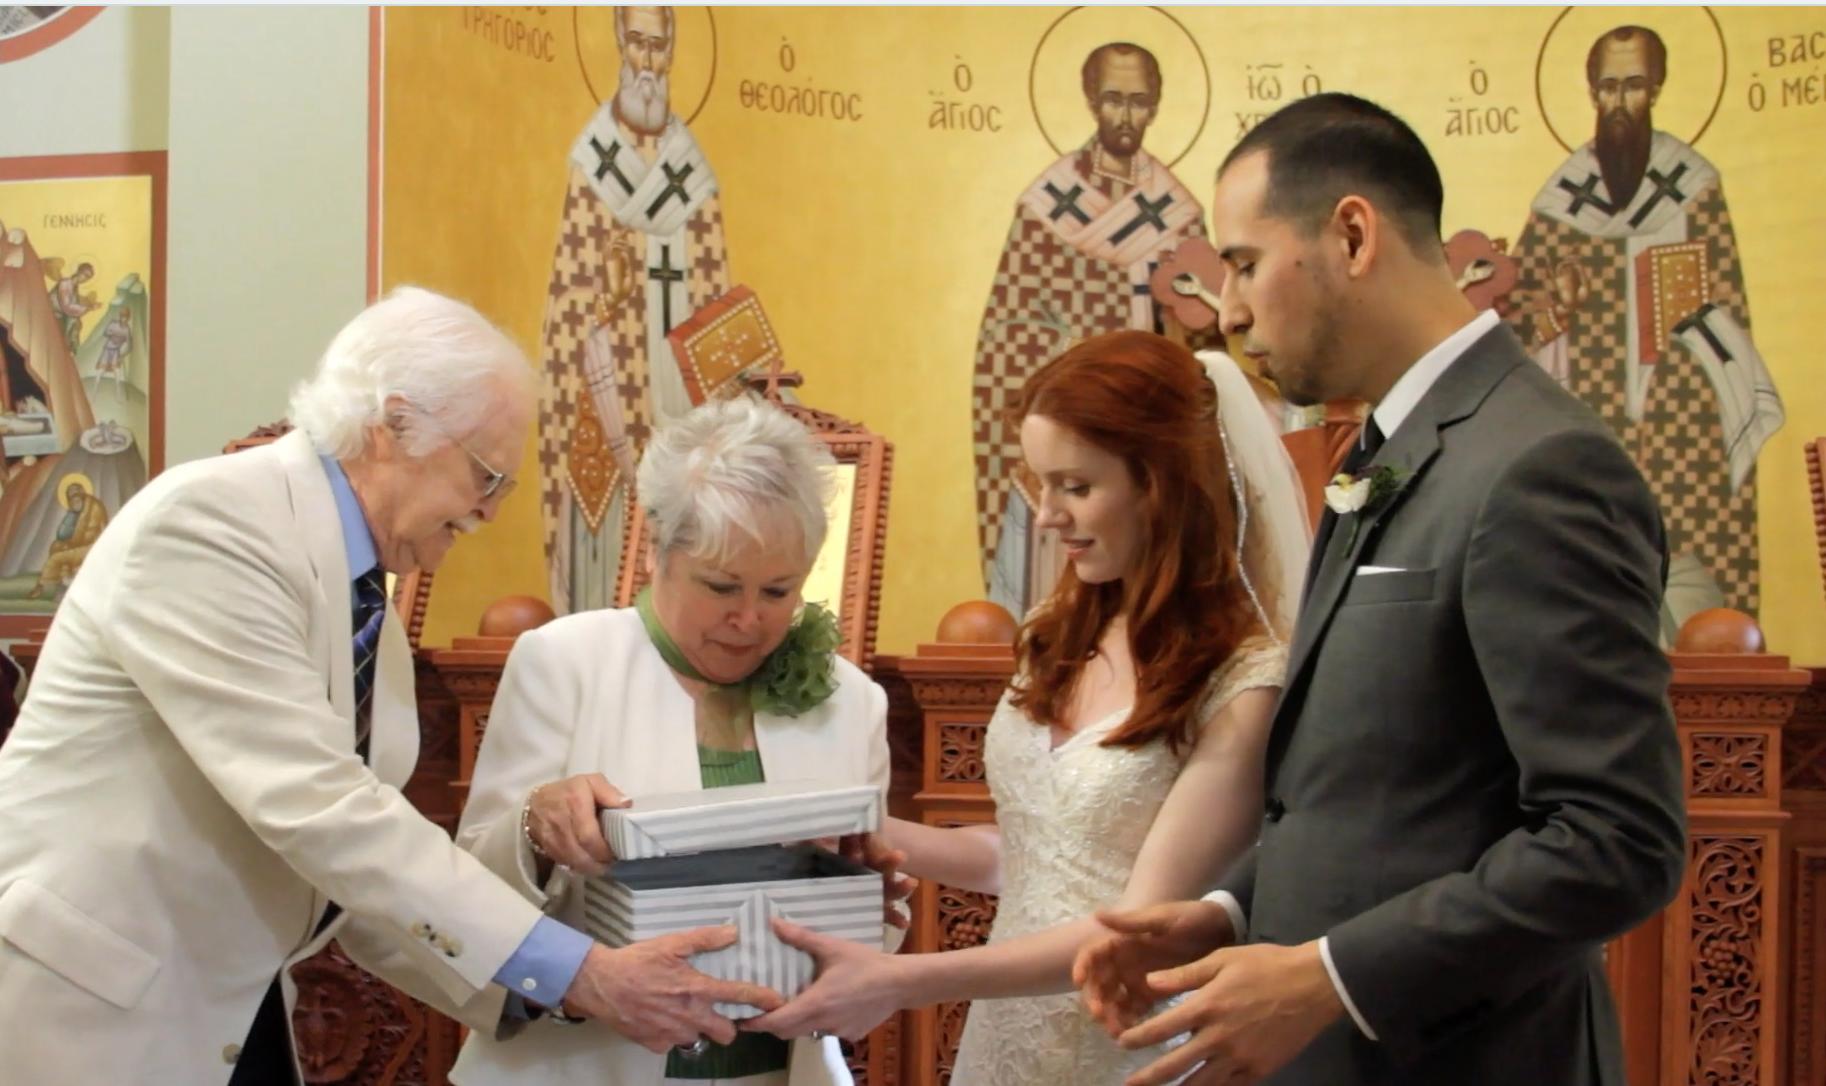 MENDEZ WEDDING RECEPTION